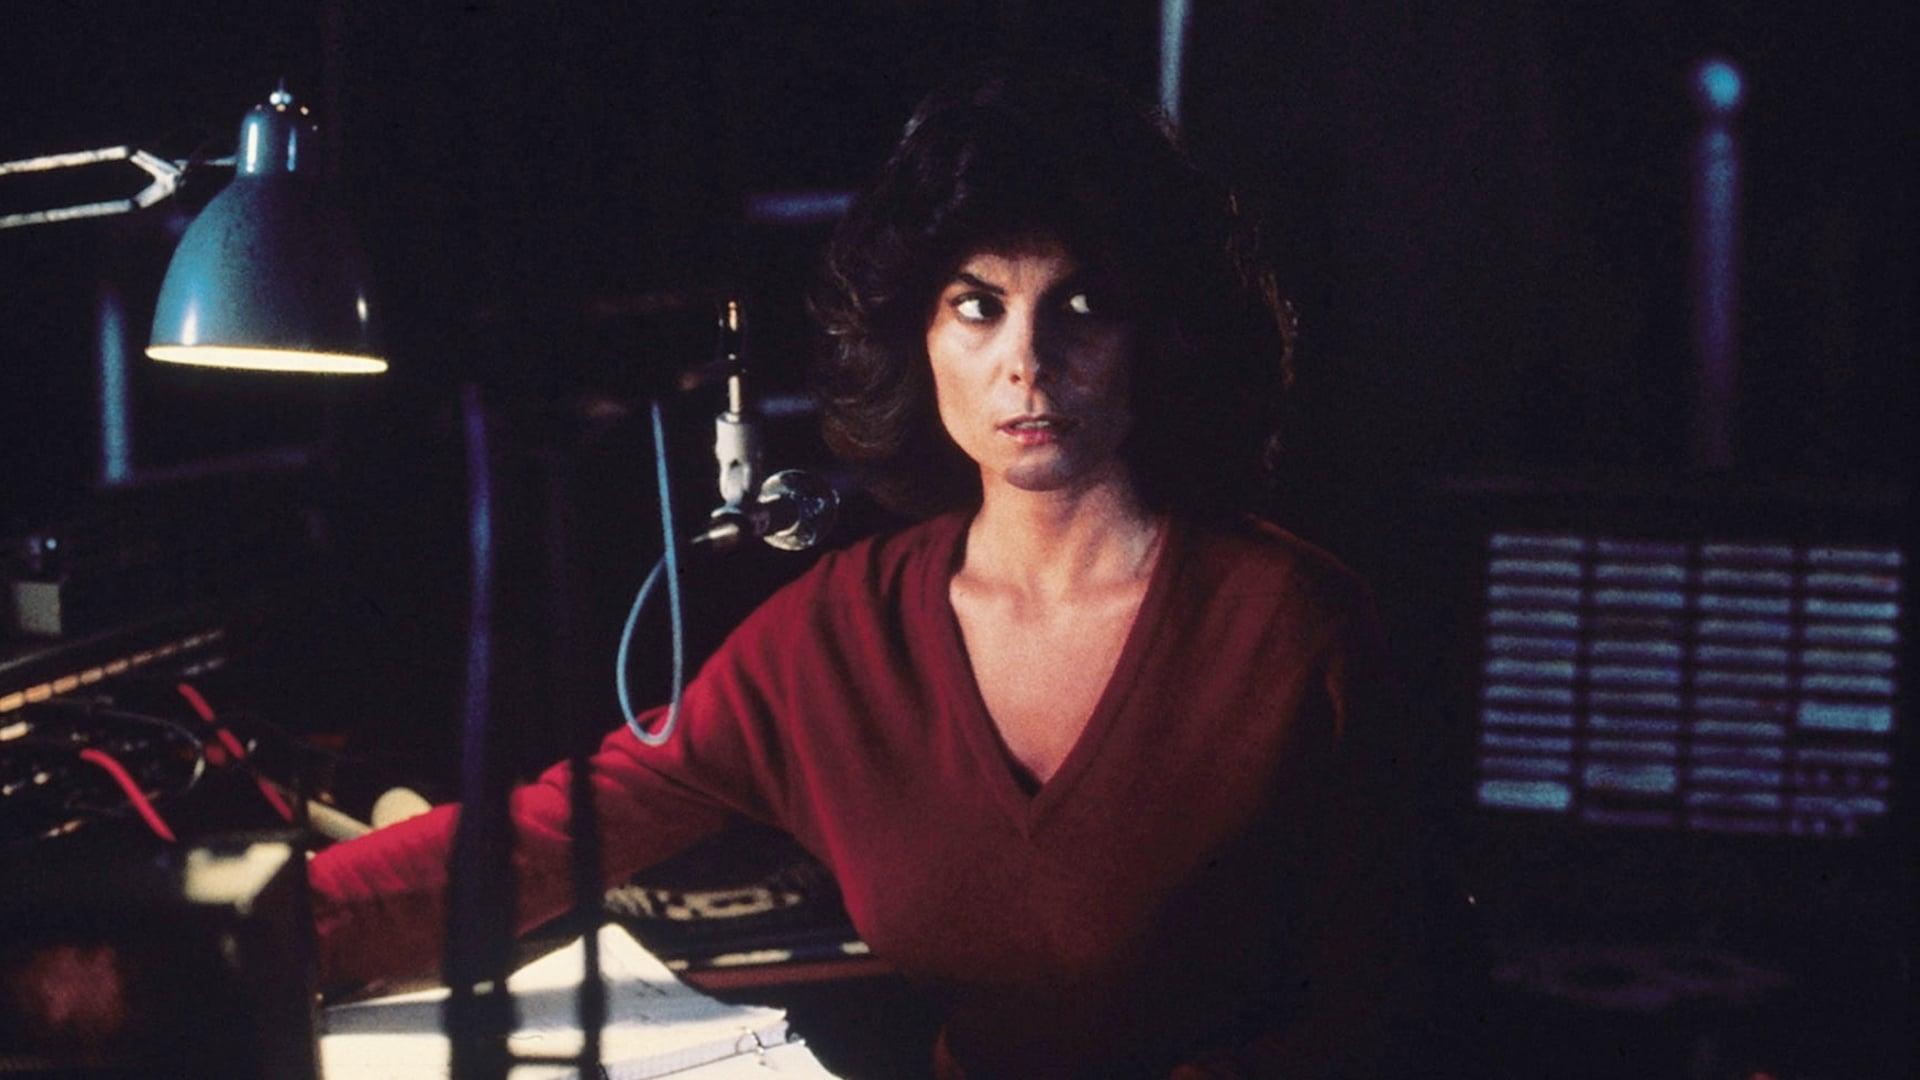 Adrienne Barbeau as radio d.j. Stevie Wayne in The Fog (1980)